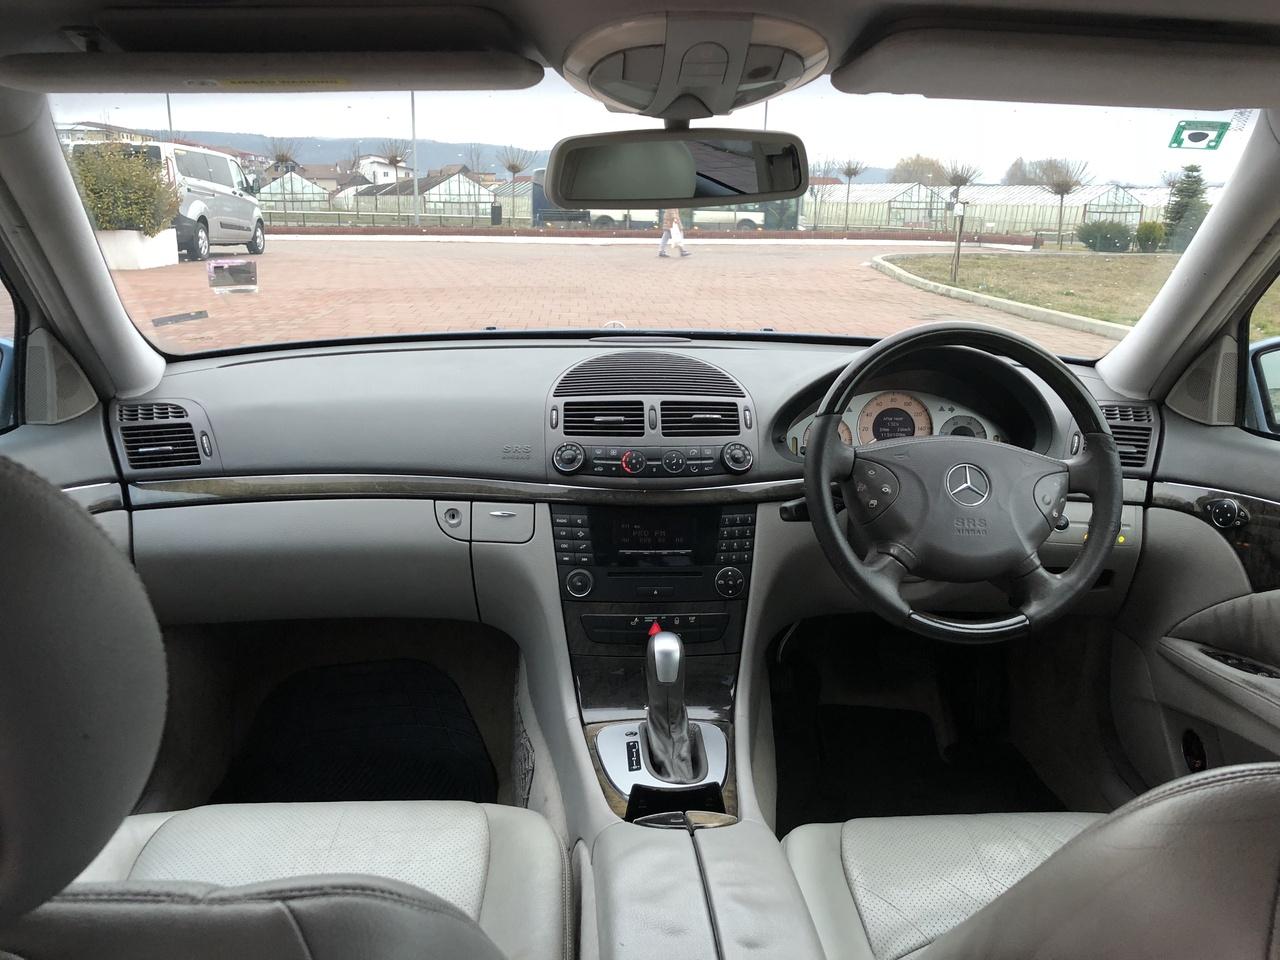 Mercedes E 320 3.2 CDI 2004